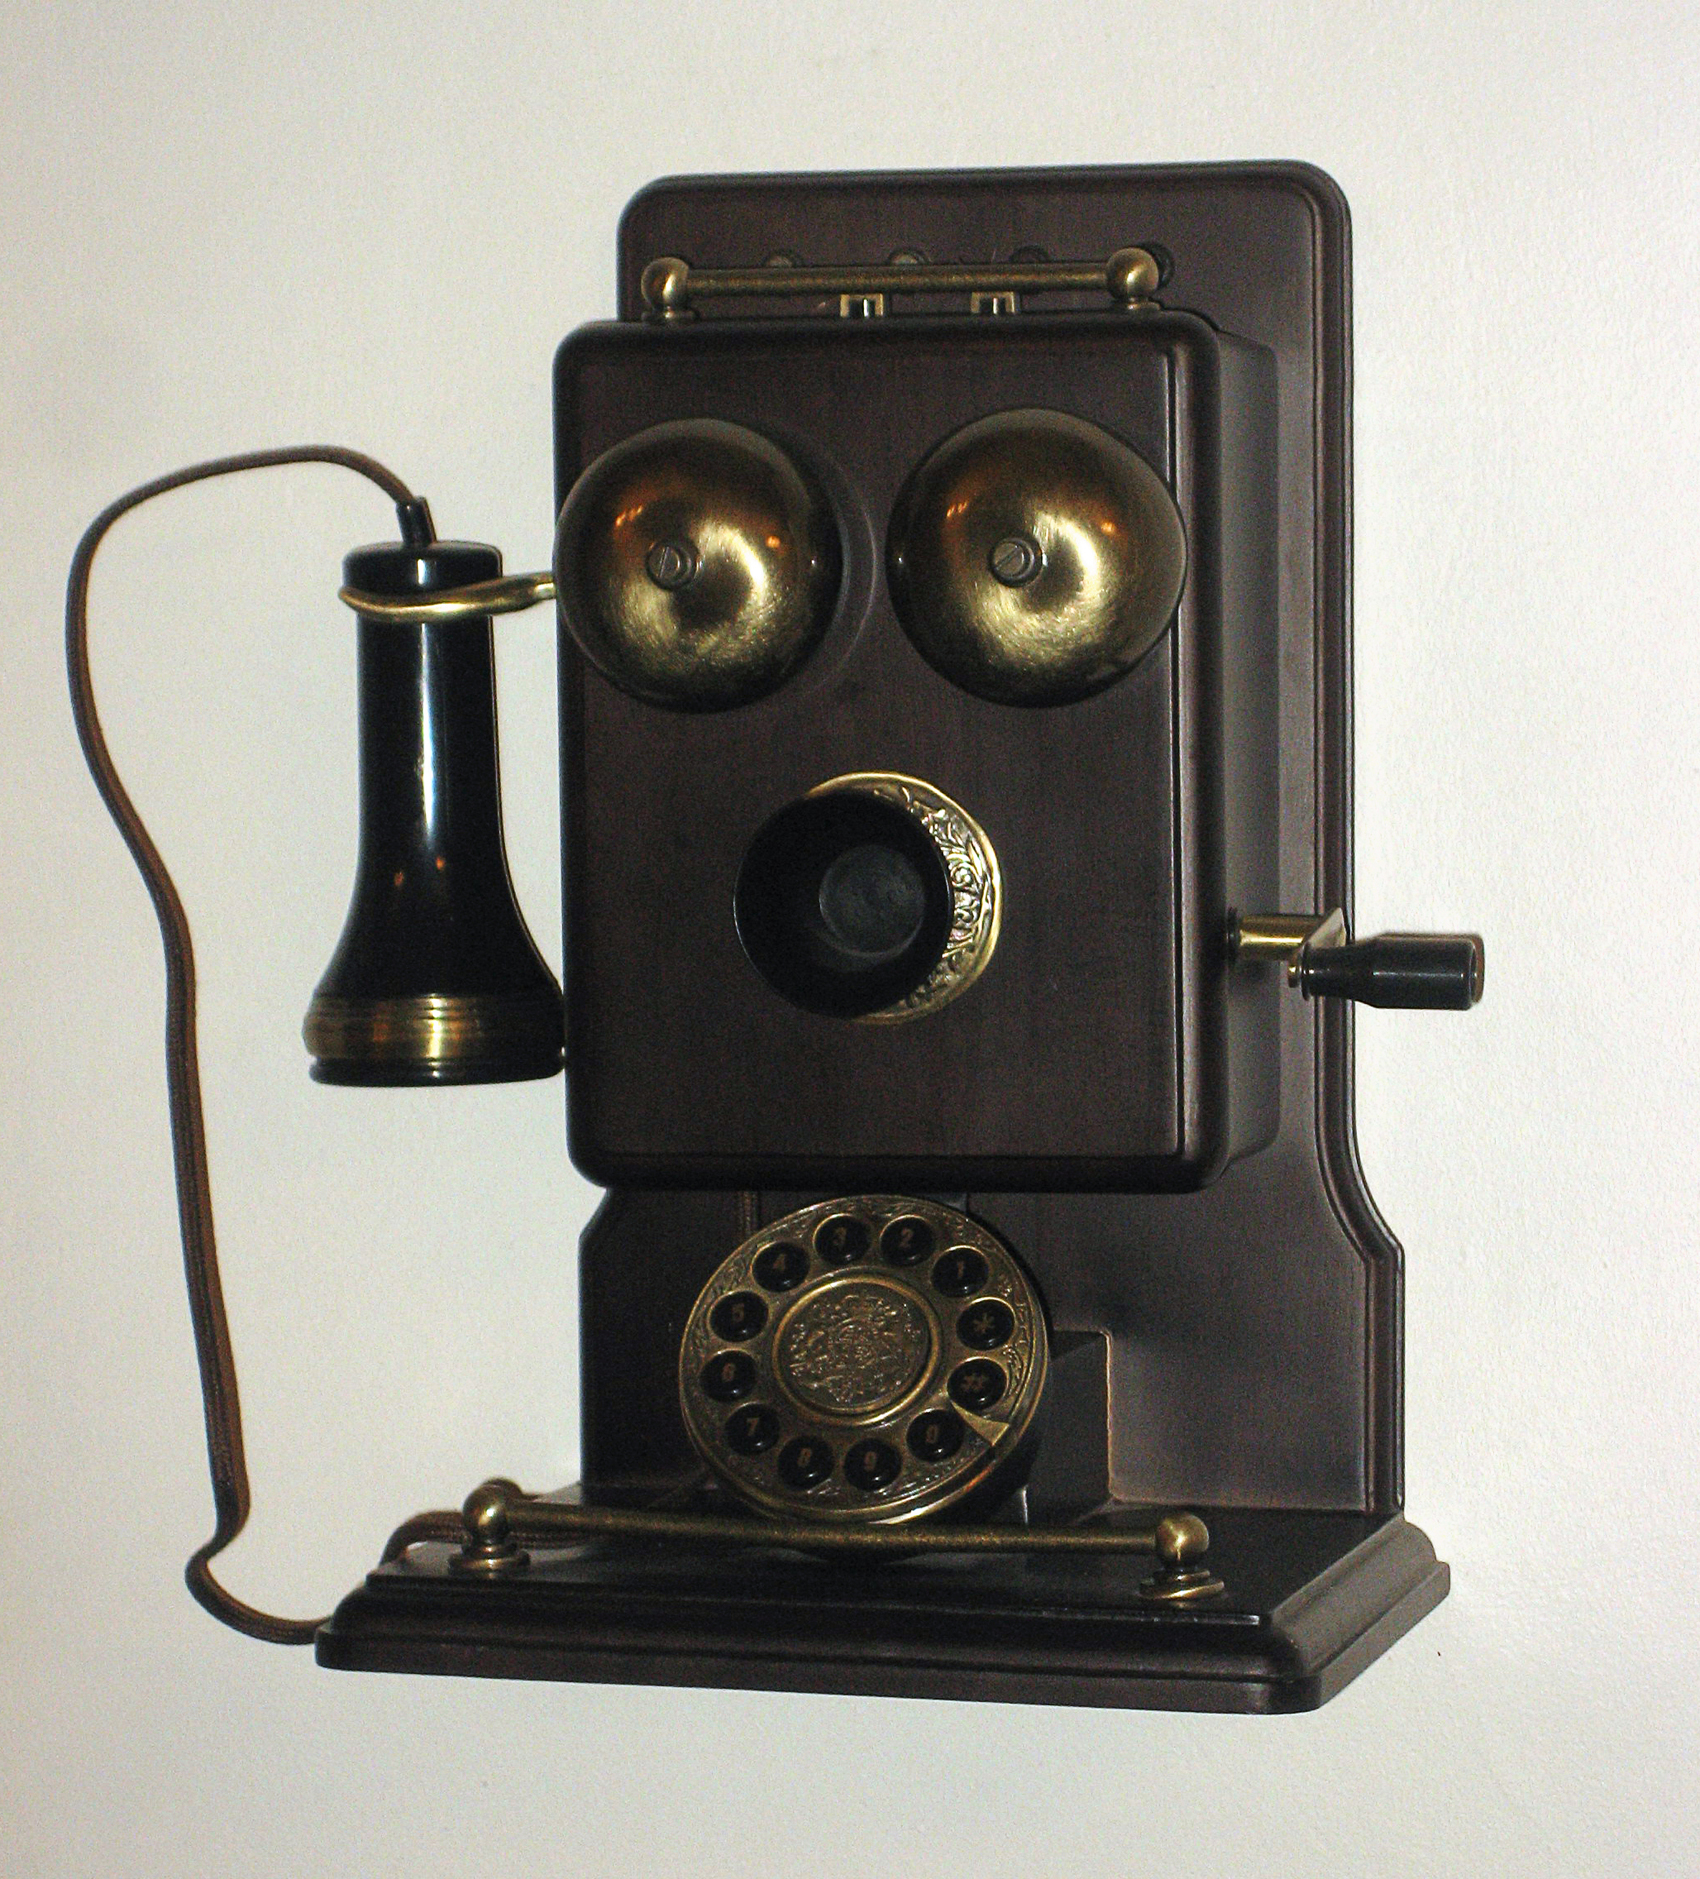 старый звонок на телефон бесплатно